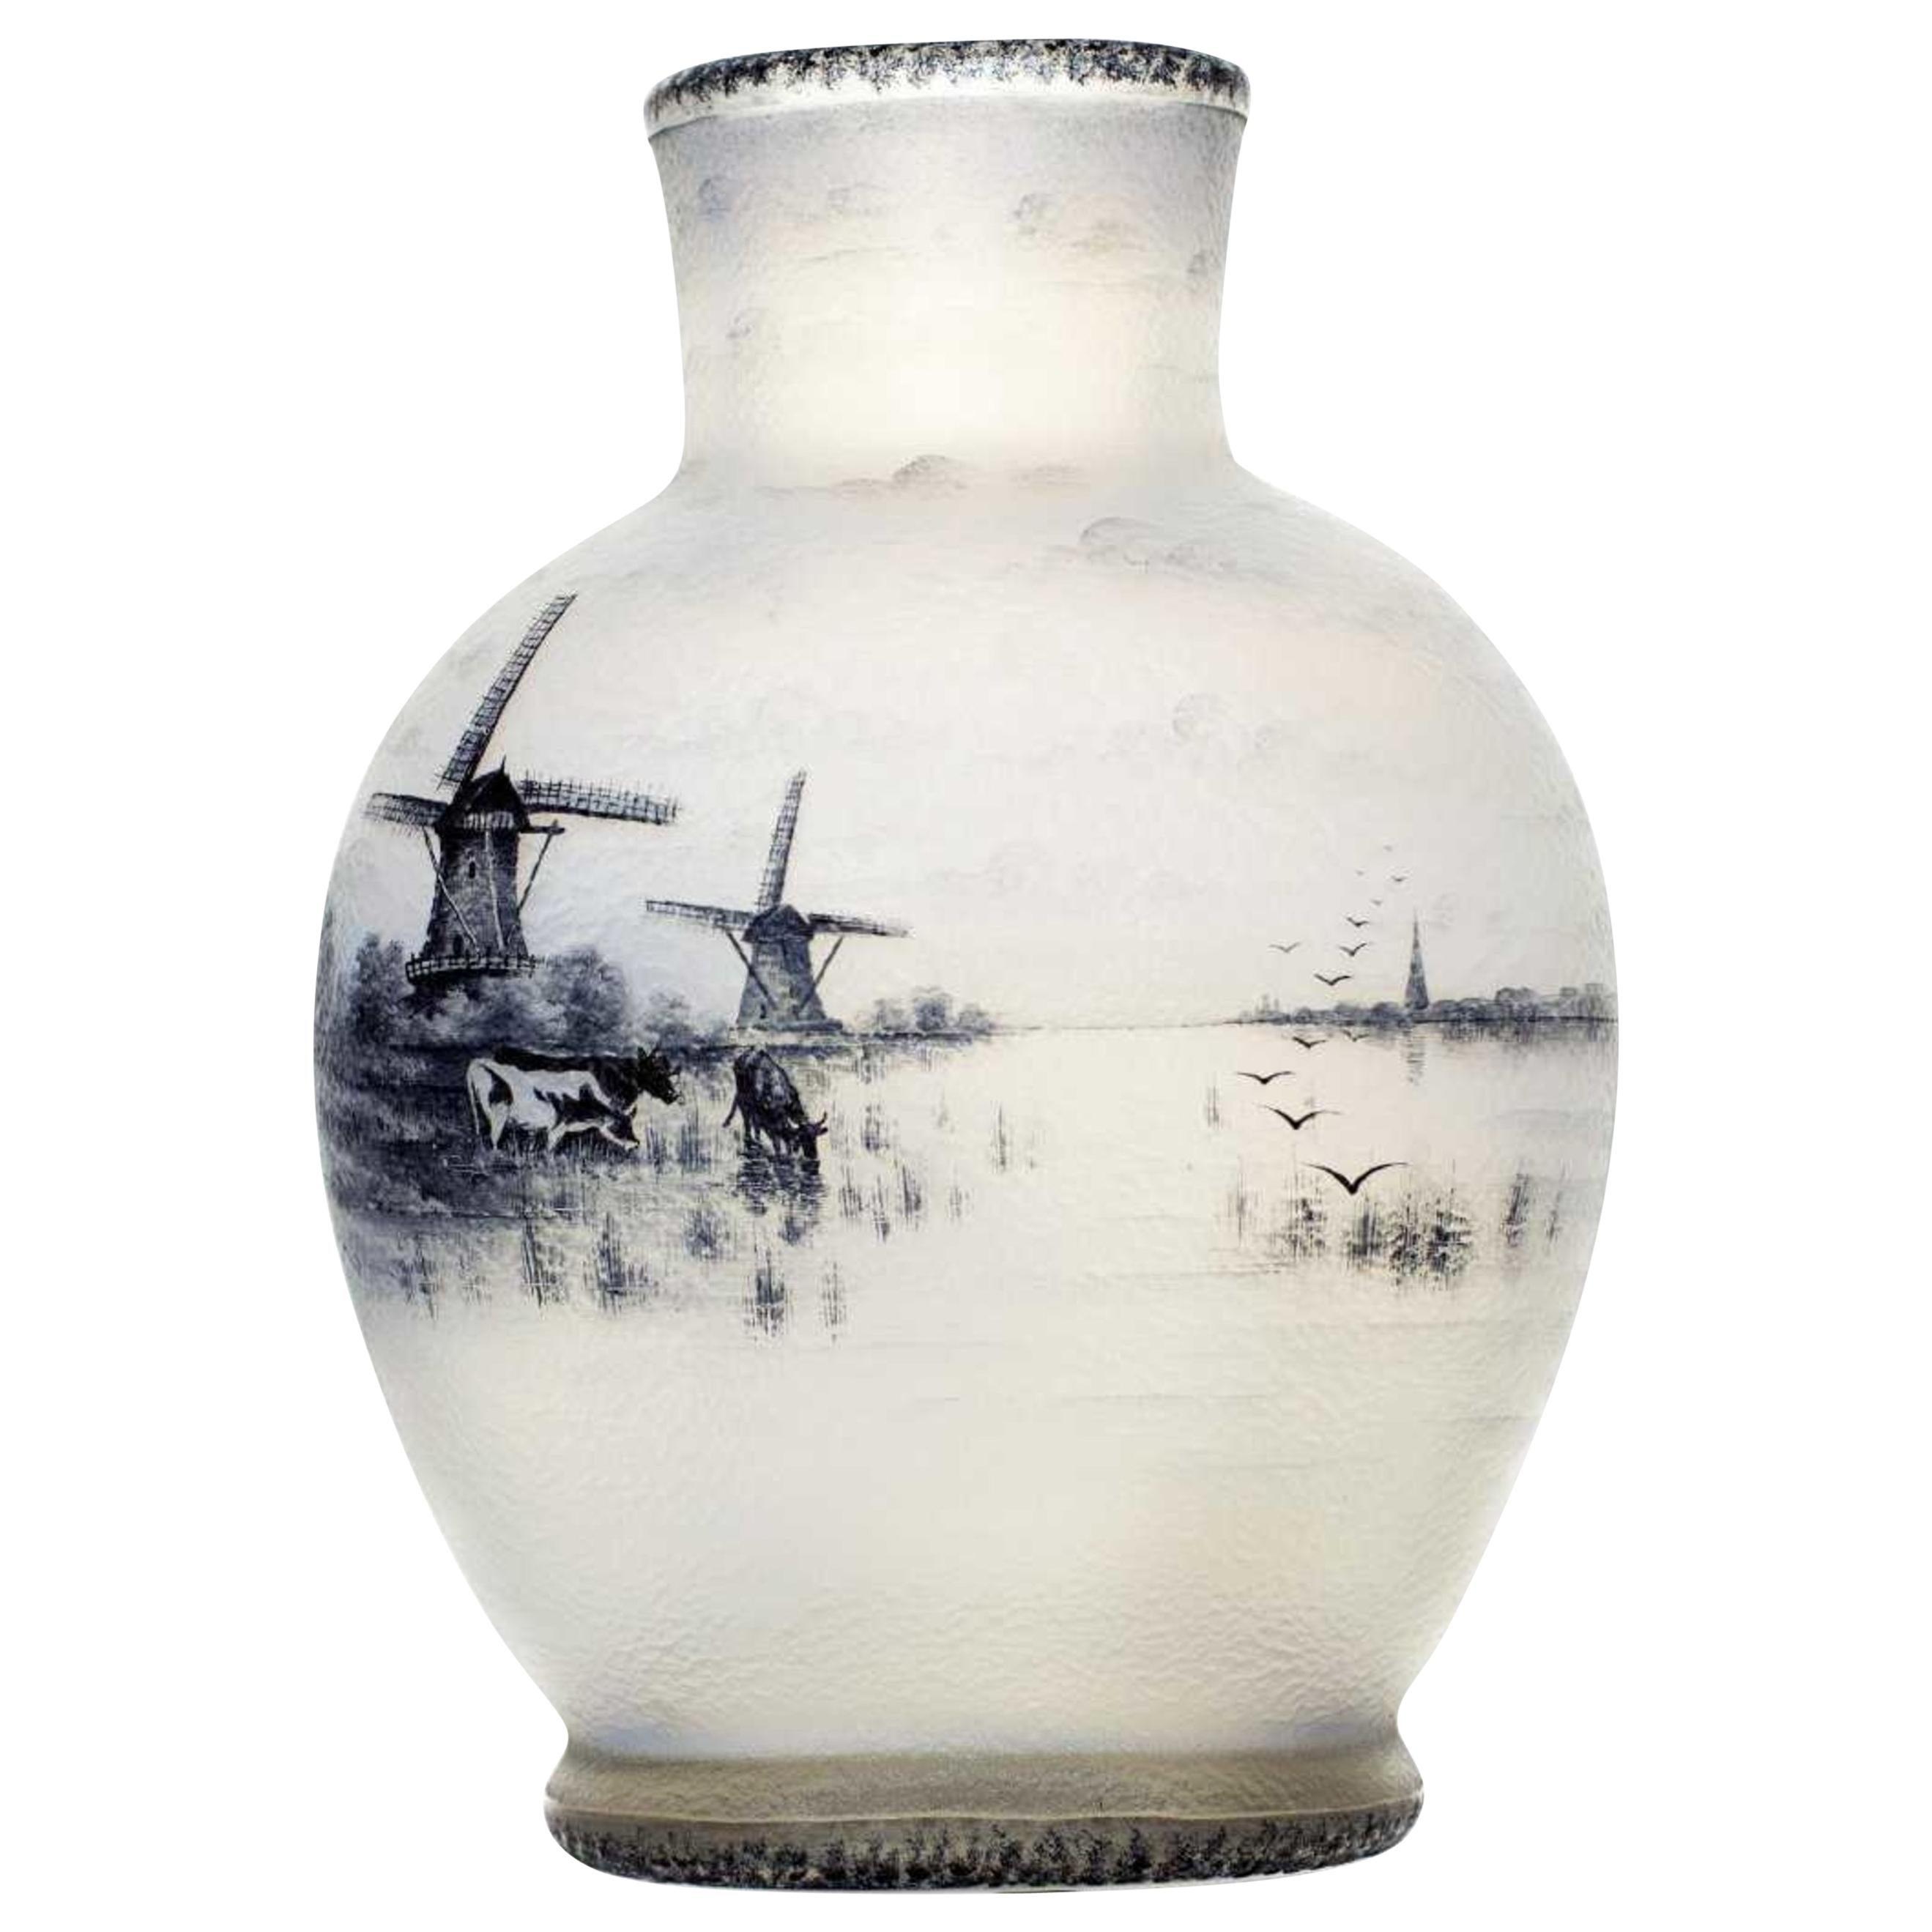 Daum Nancy enamelled and acid etched Glass Vase,  'Dutch Landscape'